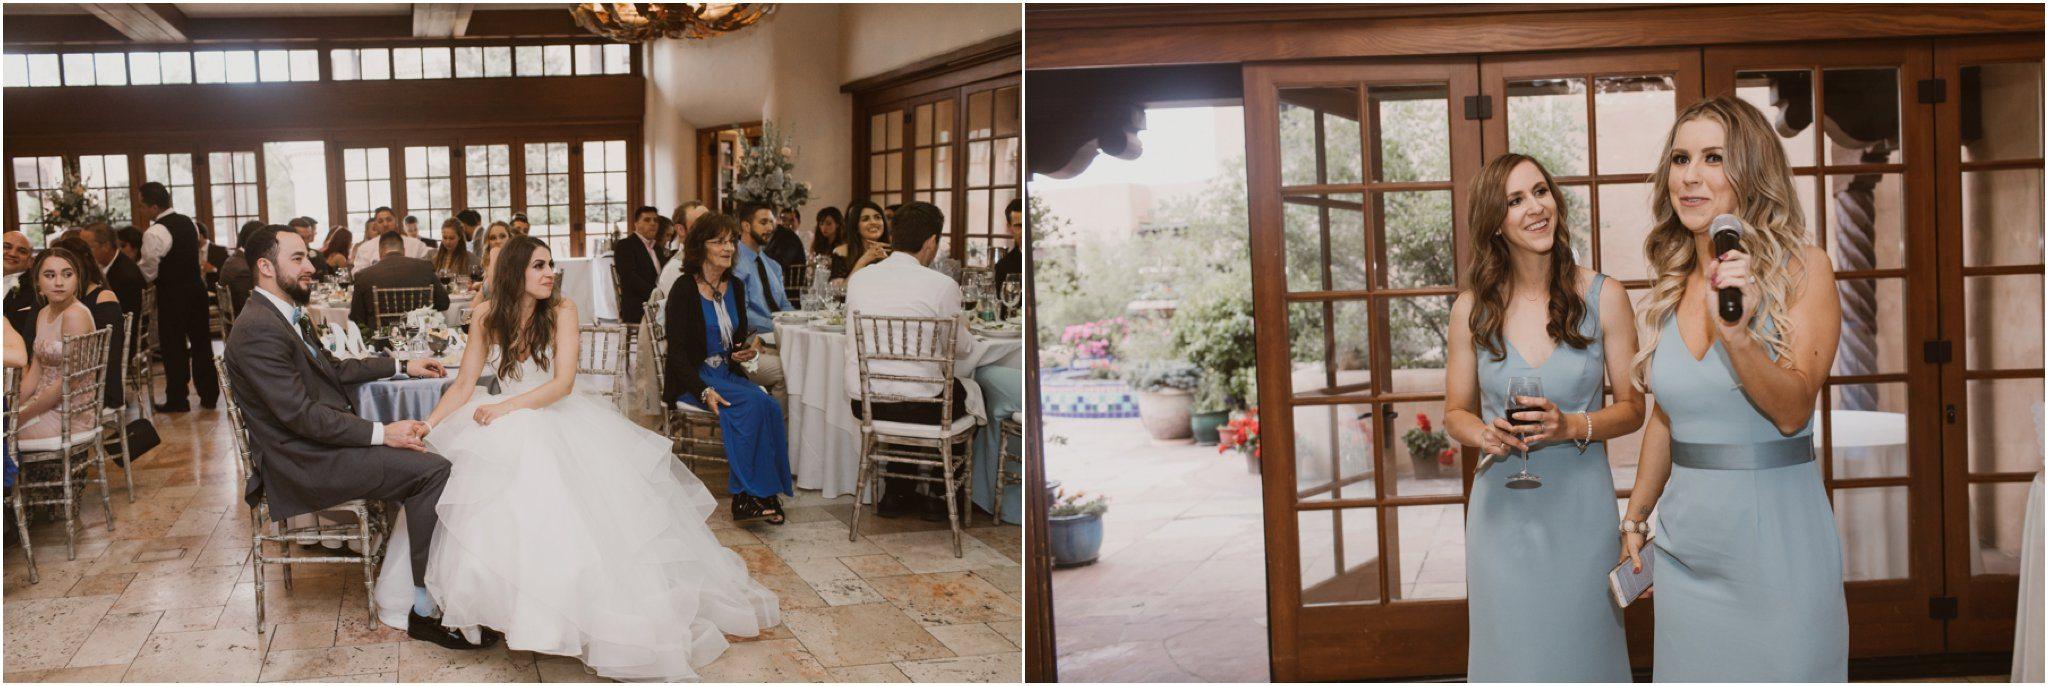 36Blue Rose Photography_ Albuquerque_ Santa Fe_ New Mexico wedding photographers